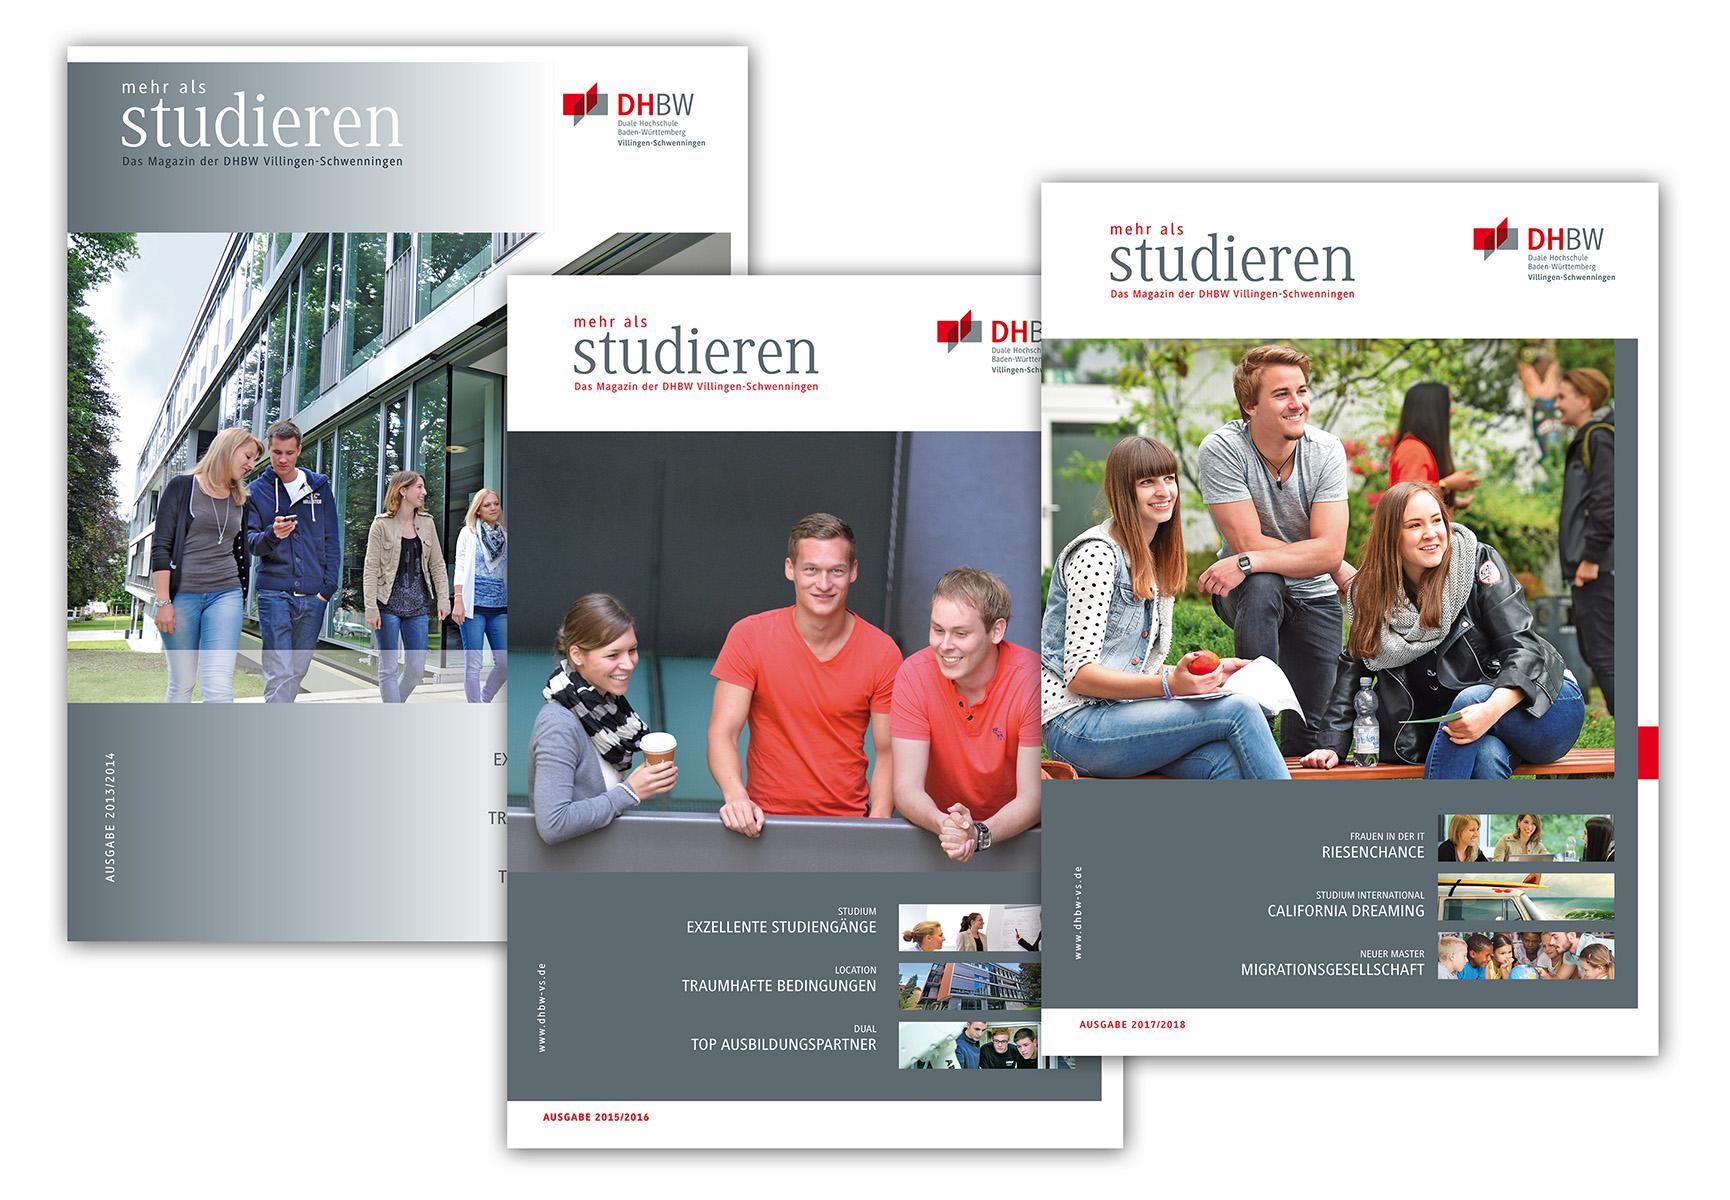 DHBW Villingen-Schwenningen Magazin